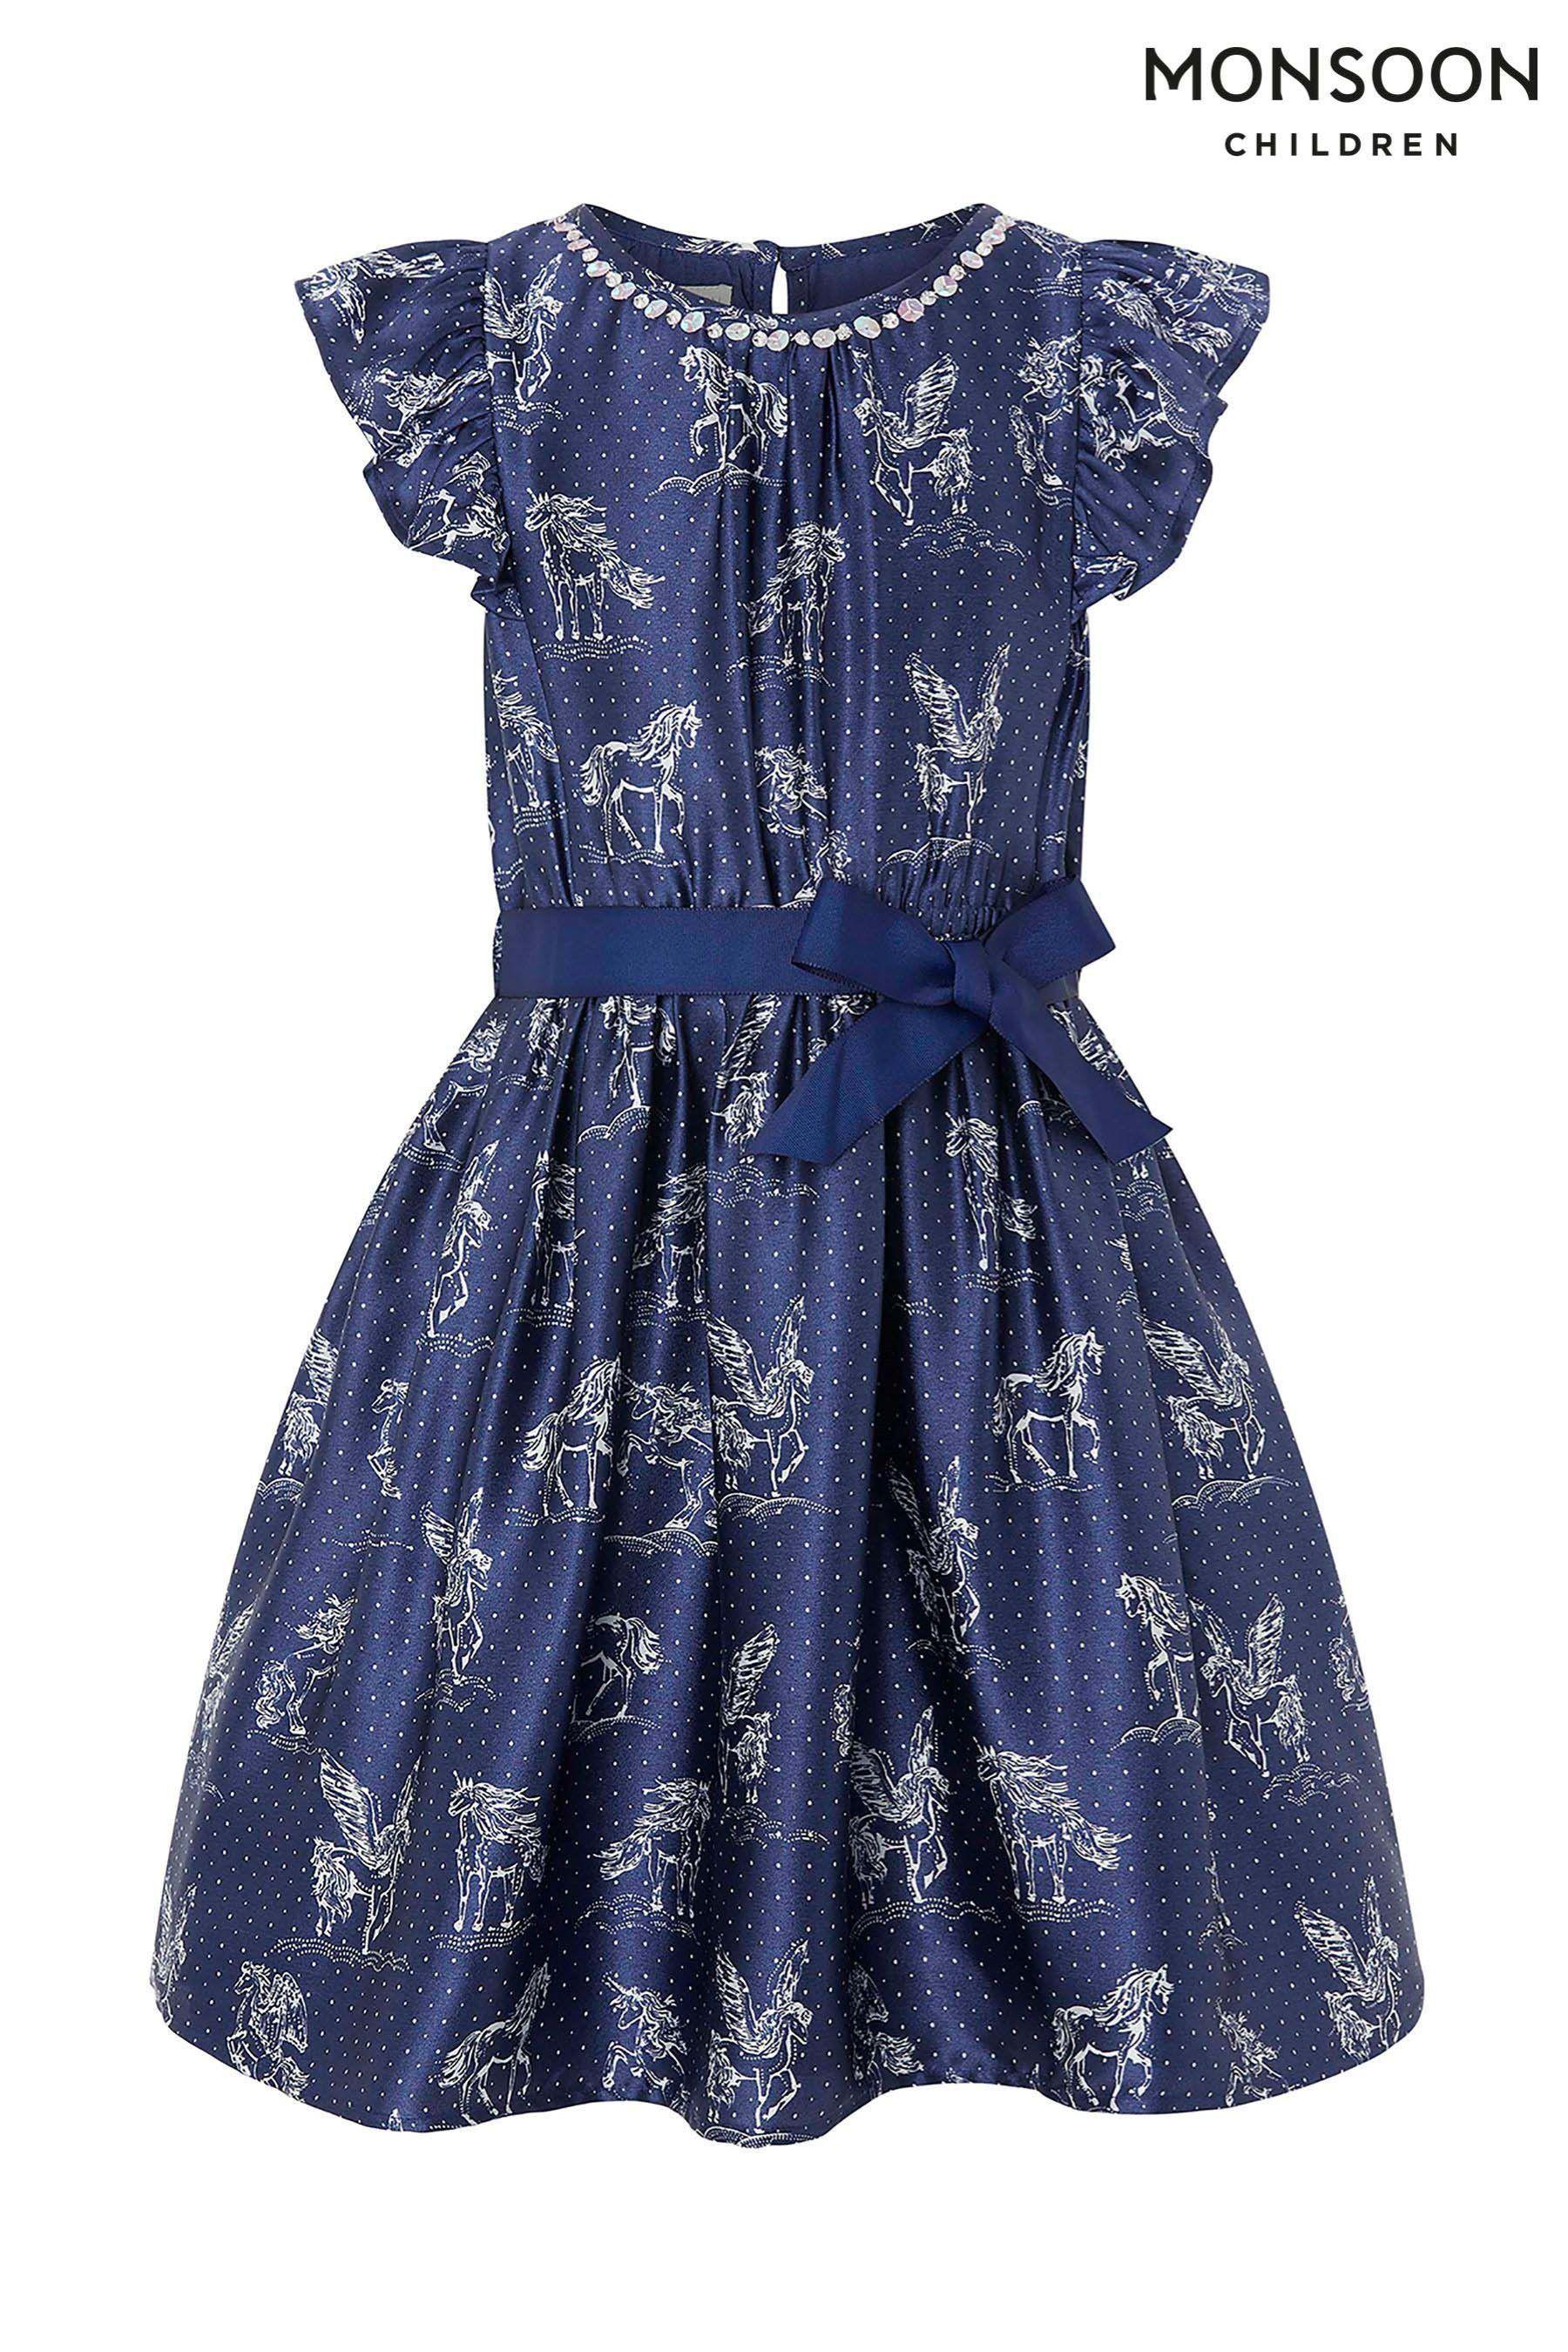 1cd5e9ecce51 Girls Monsoon Evalyn Unicorn Satin Dress - Blue